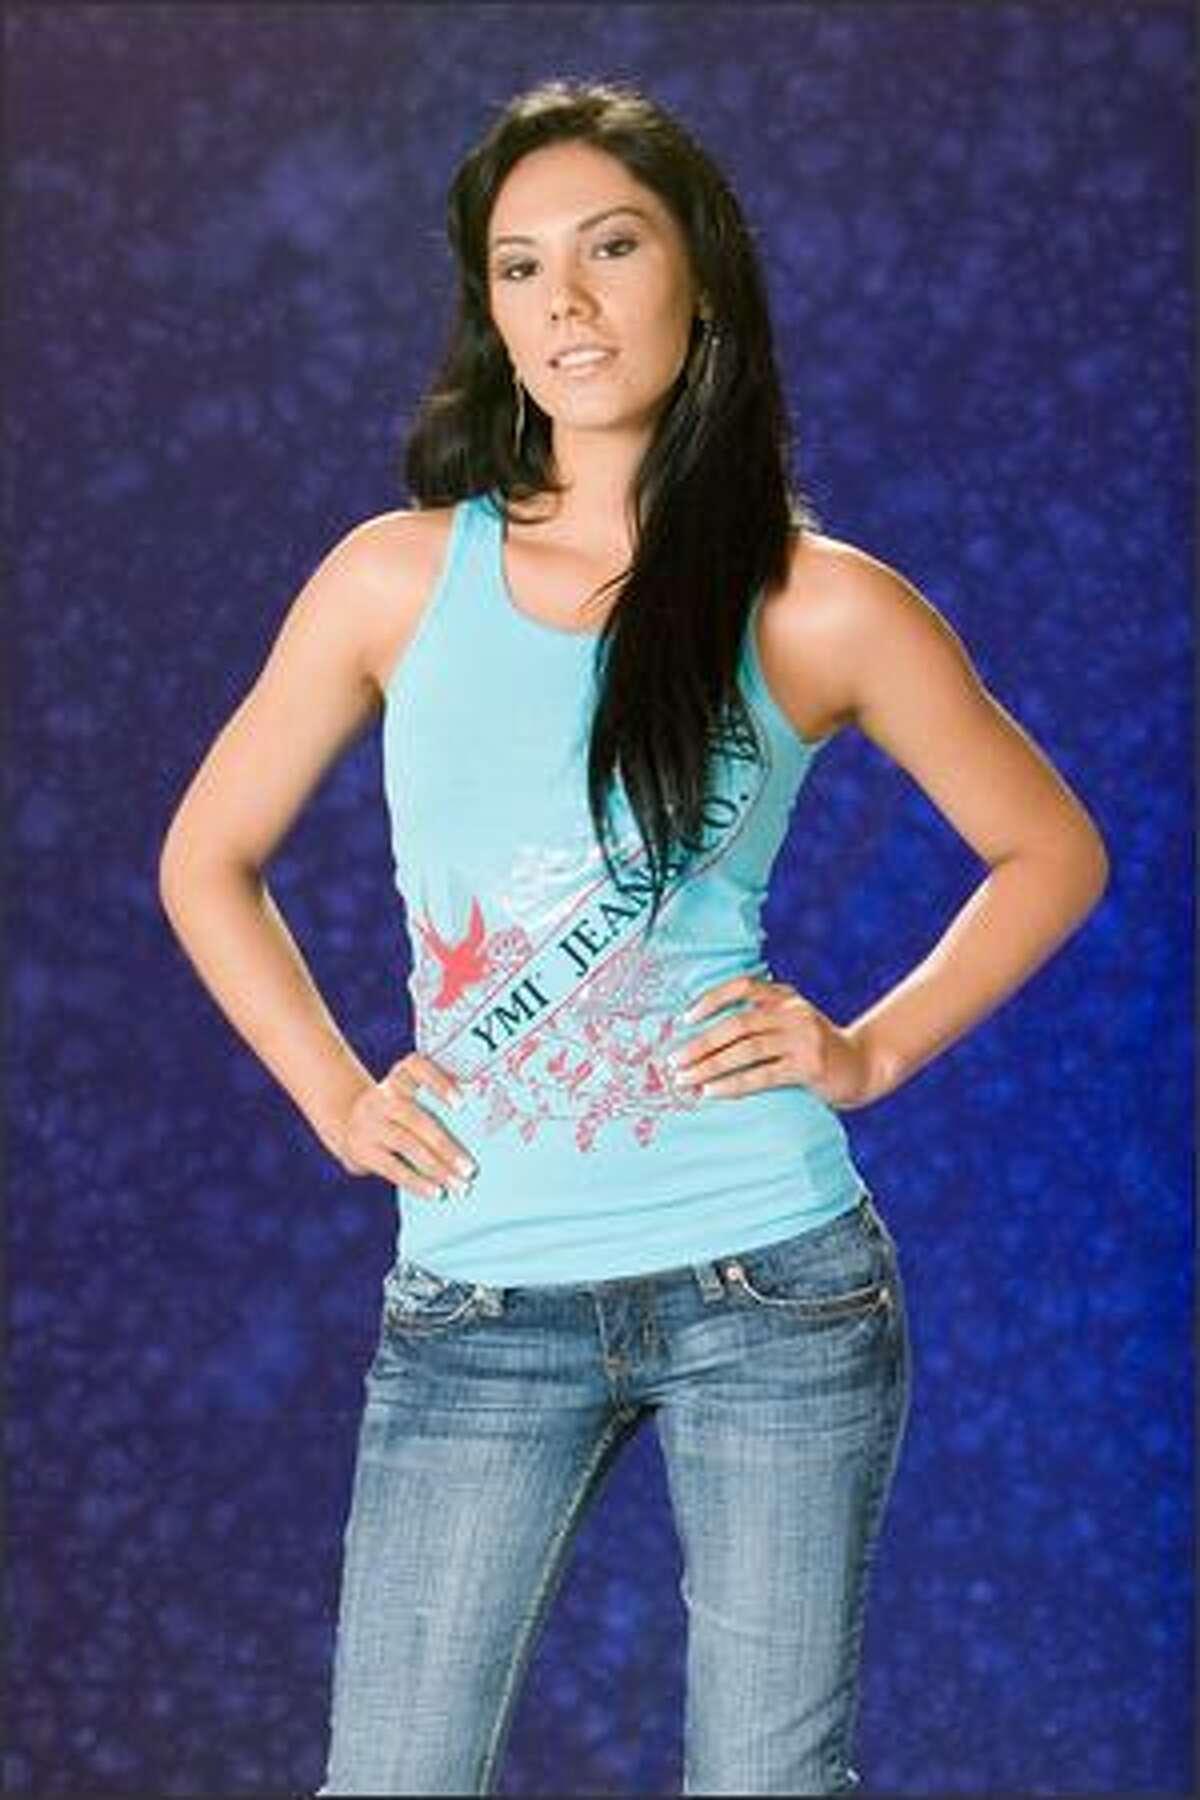 Lissette Rodriguez, Miss El Salvador 2007.